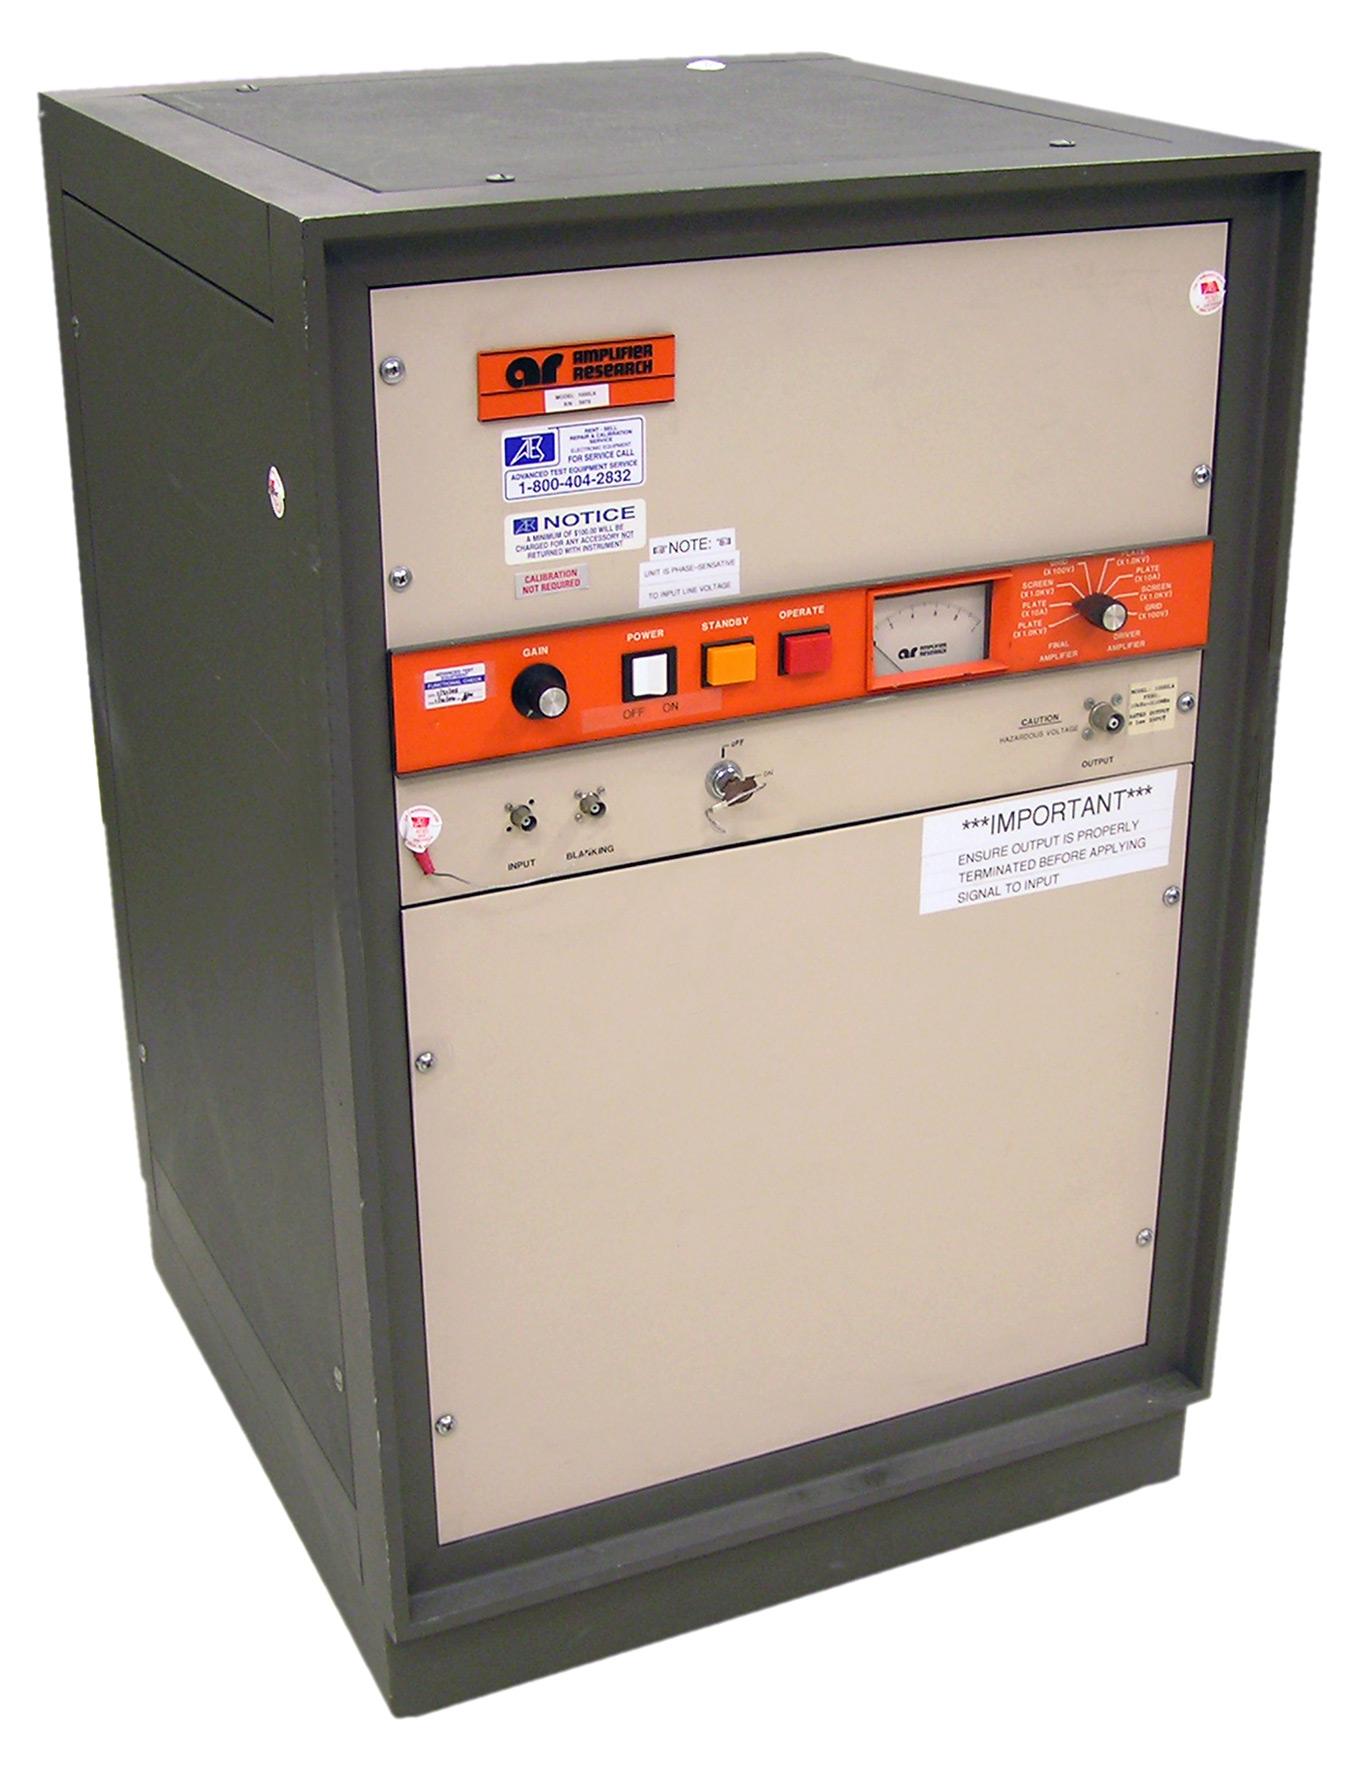 1000l Amplifier Research Test Equipment Atec Rentals Accessories Fm Gain Signal 180 Rf 10 Khz 220 Mhz